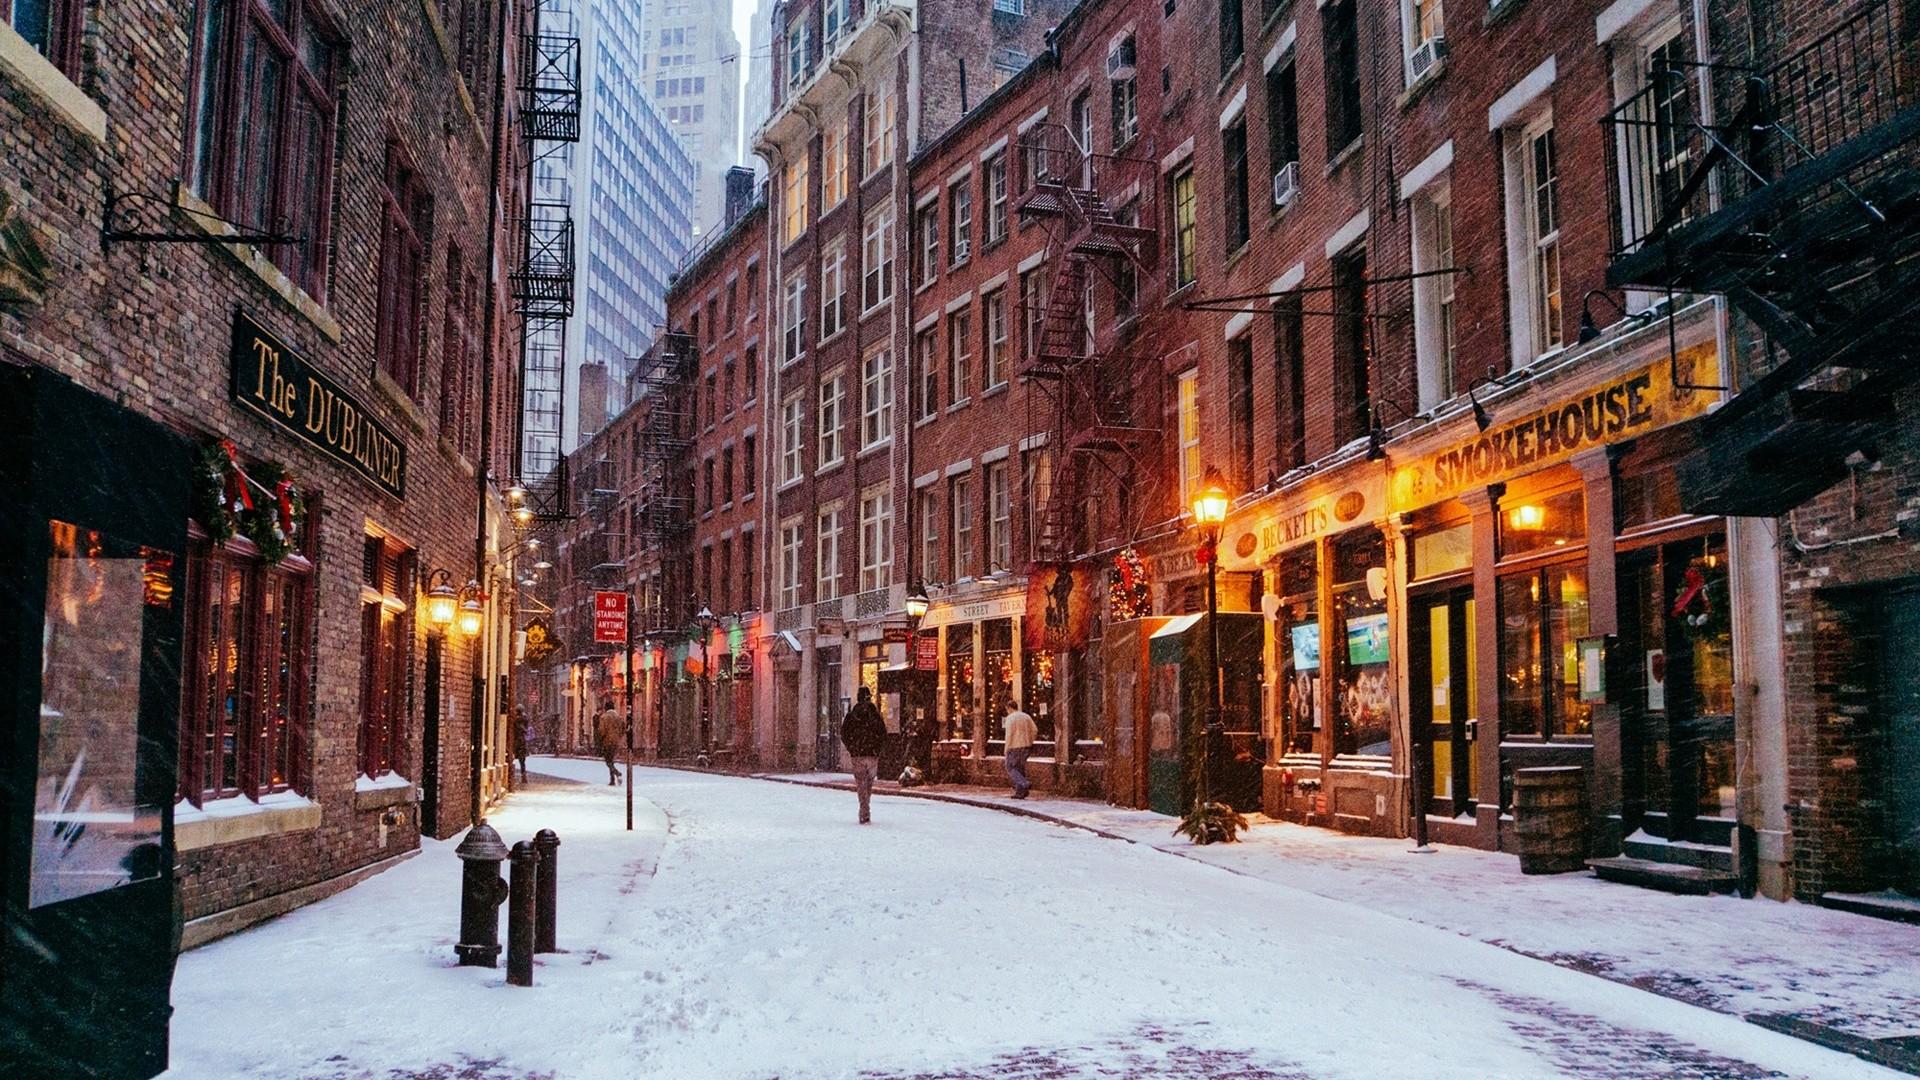 Winter City Wallpapers Full Hd